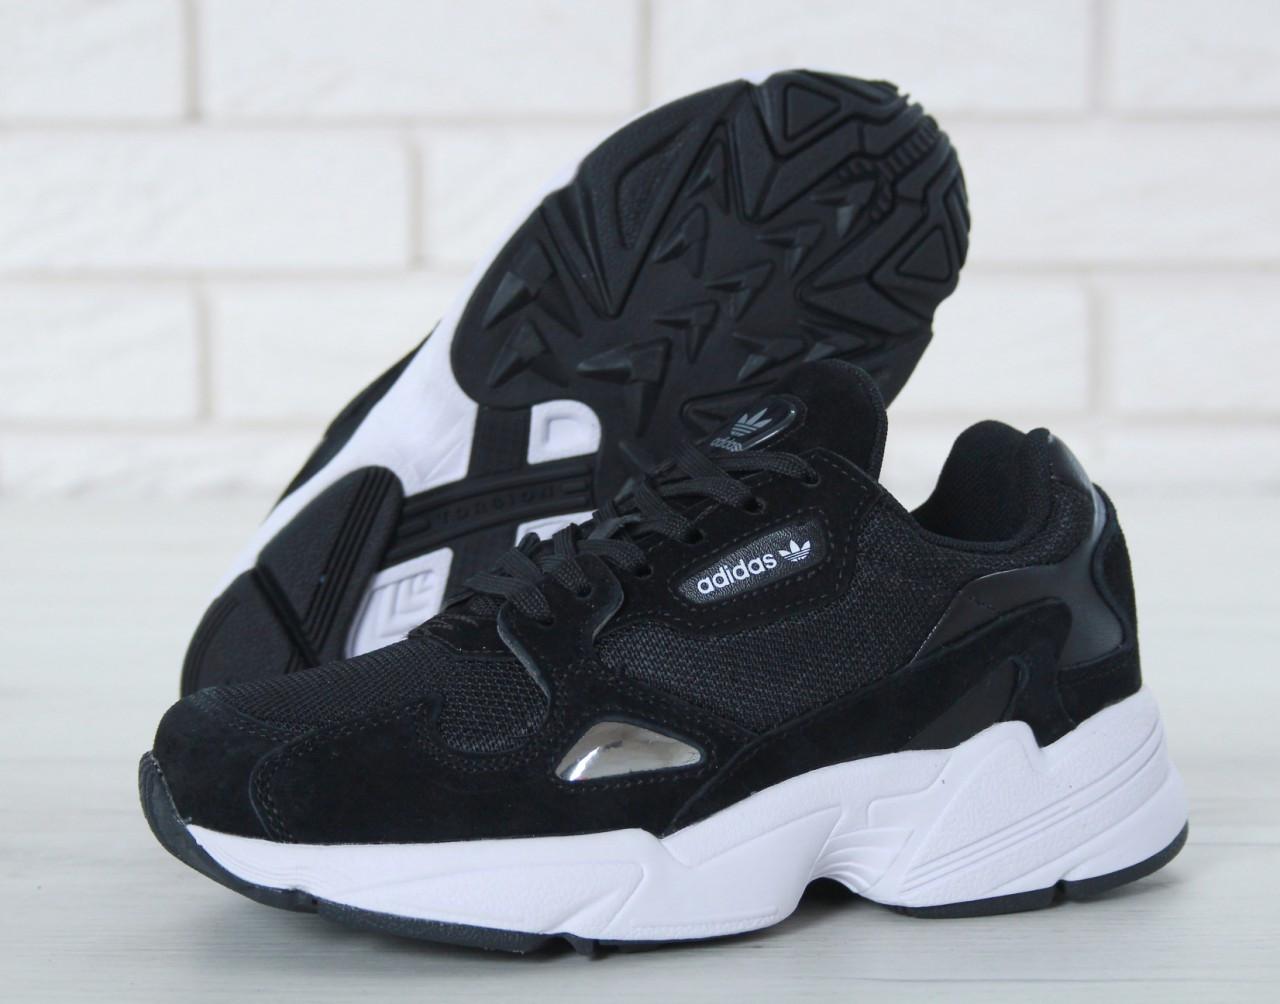 98e1f5ac Женские кроссовки Adidas Falcon black White, адидас фалькон: 1 320 ...